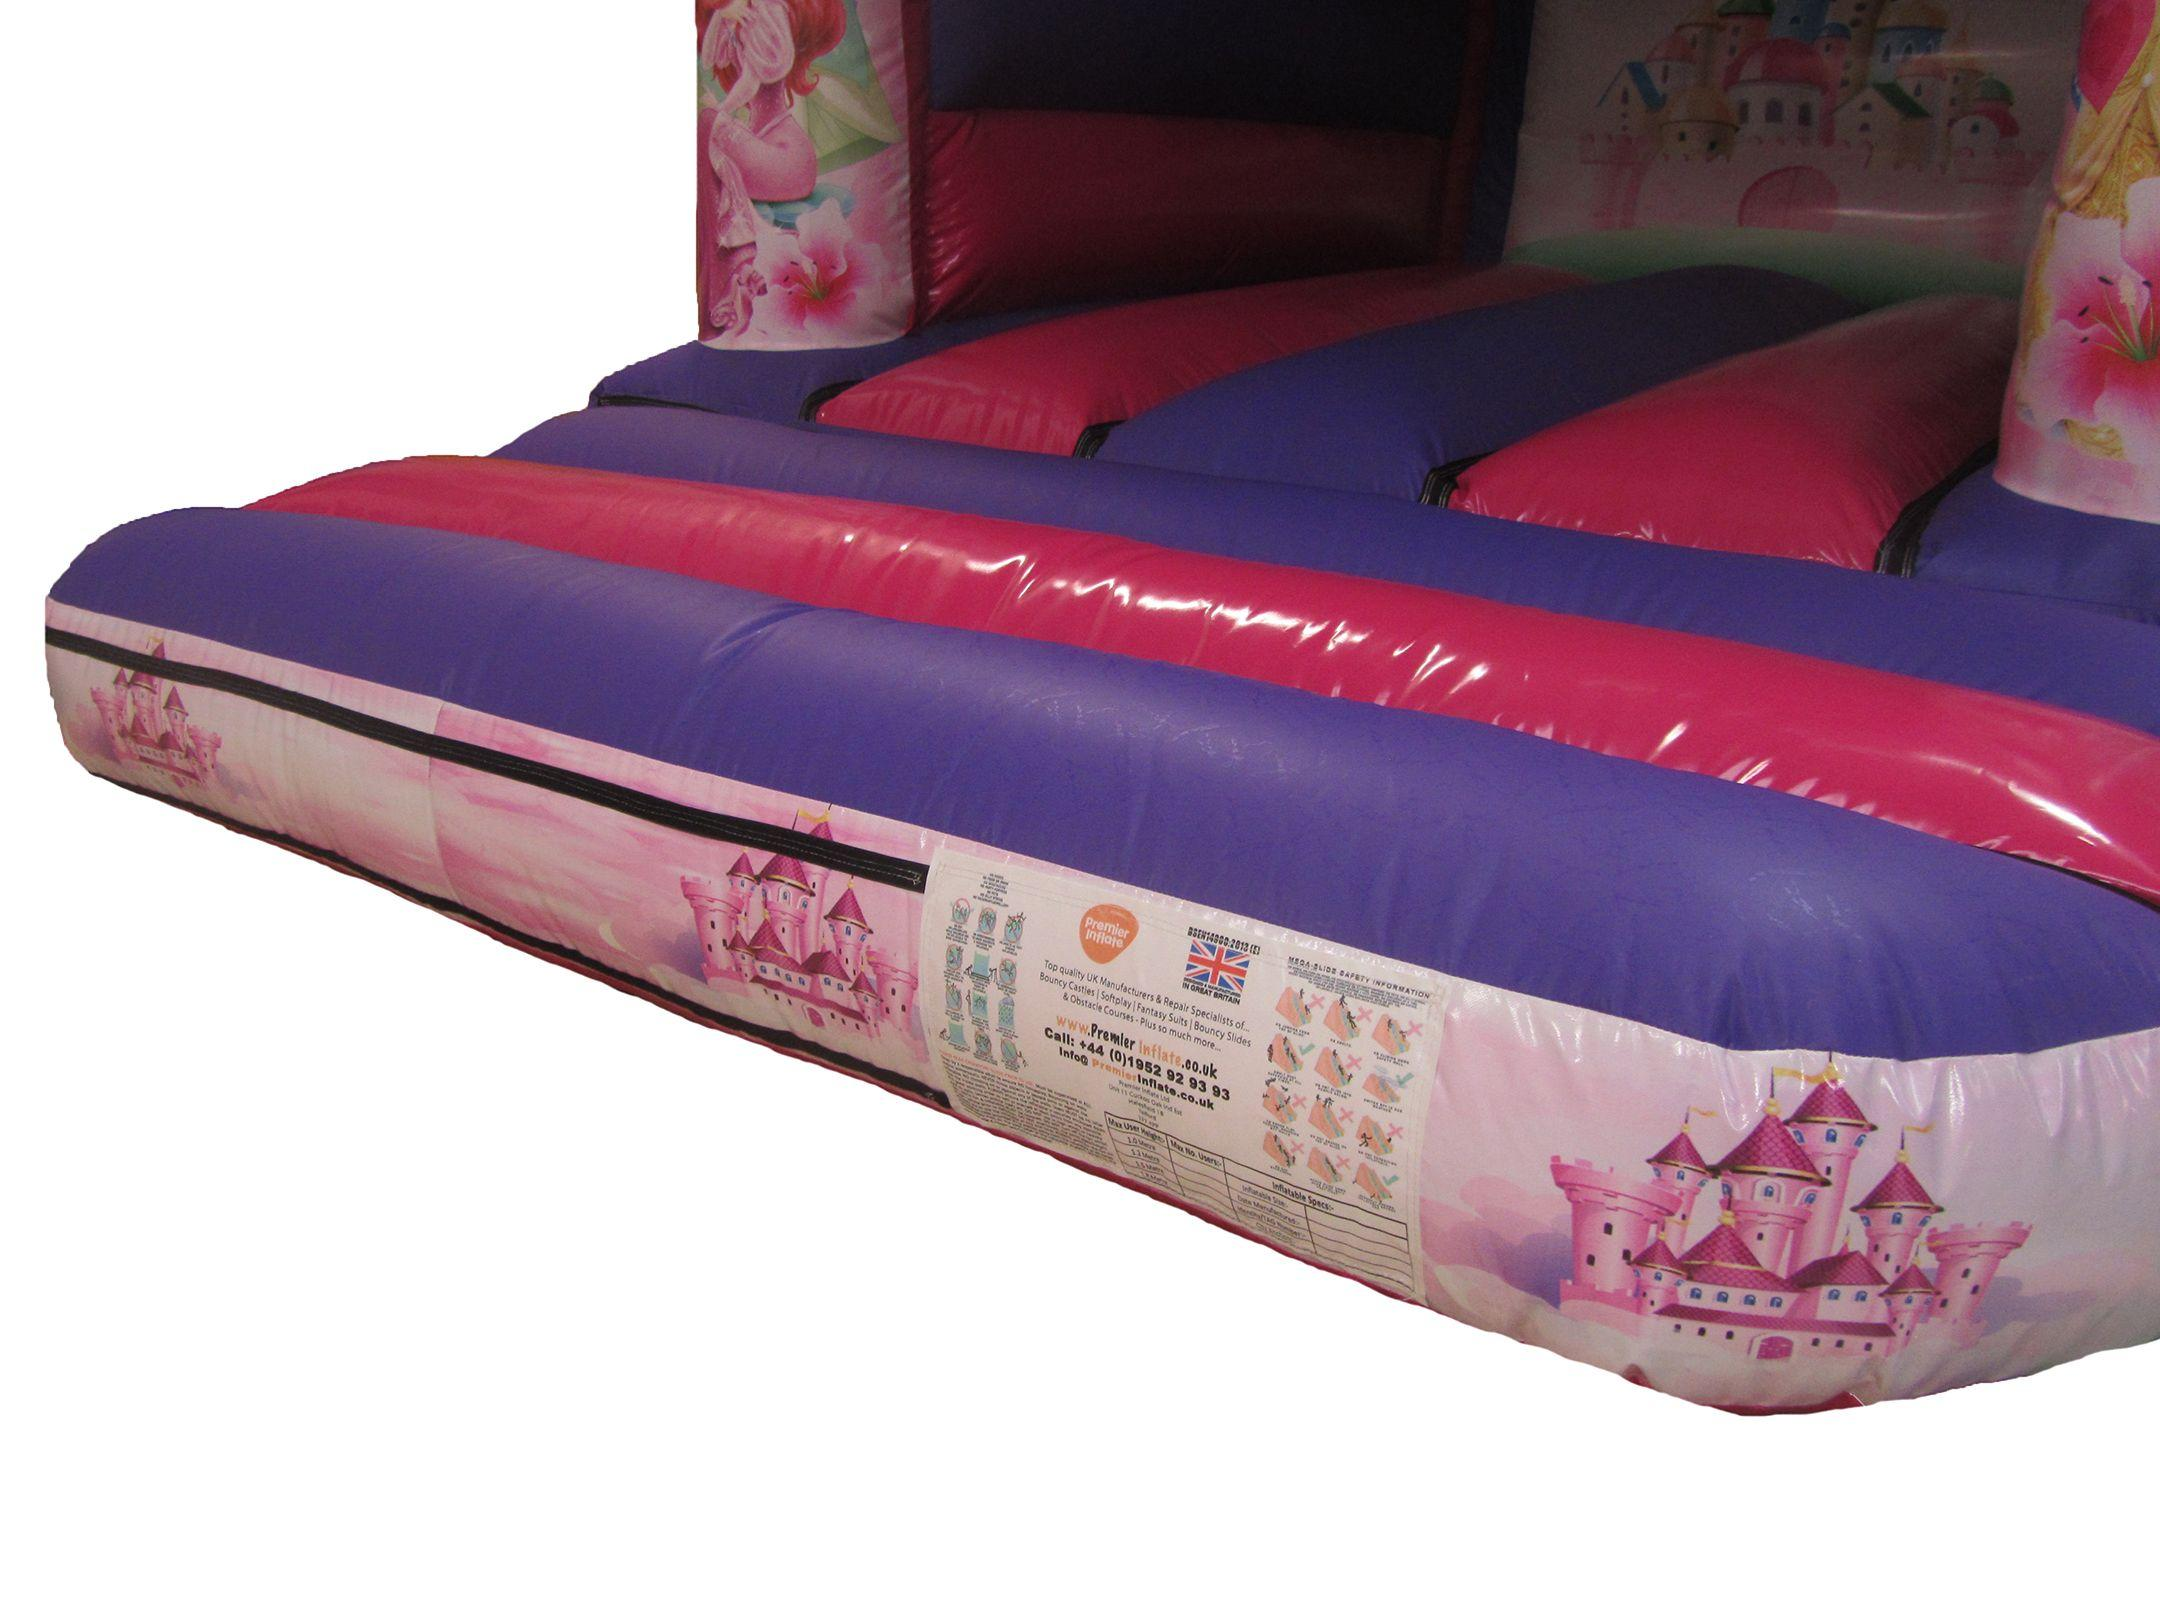 Princess themed artwork on Bouncy Castle